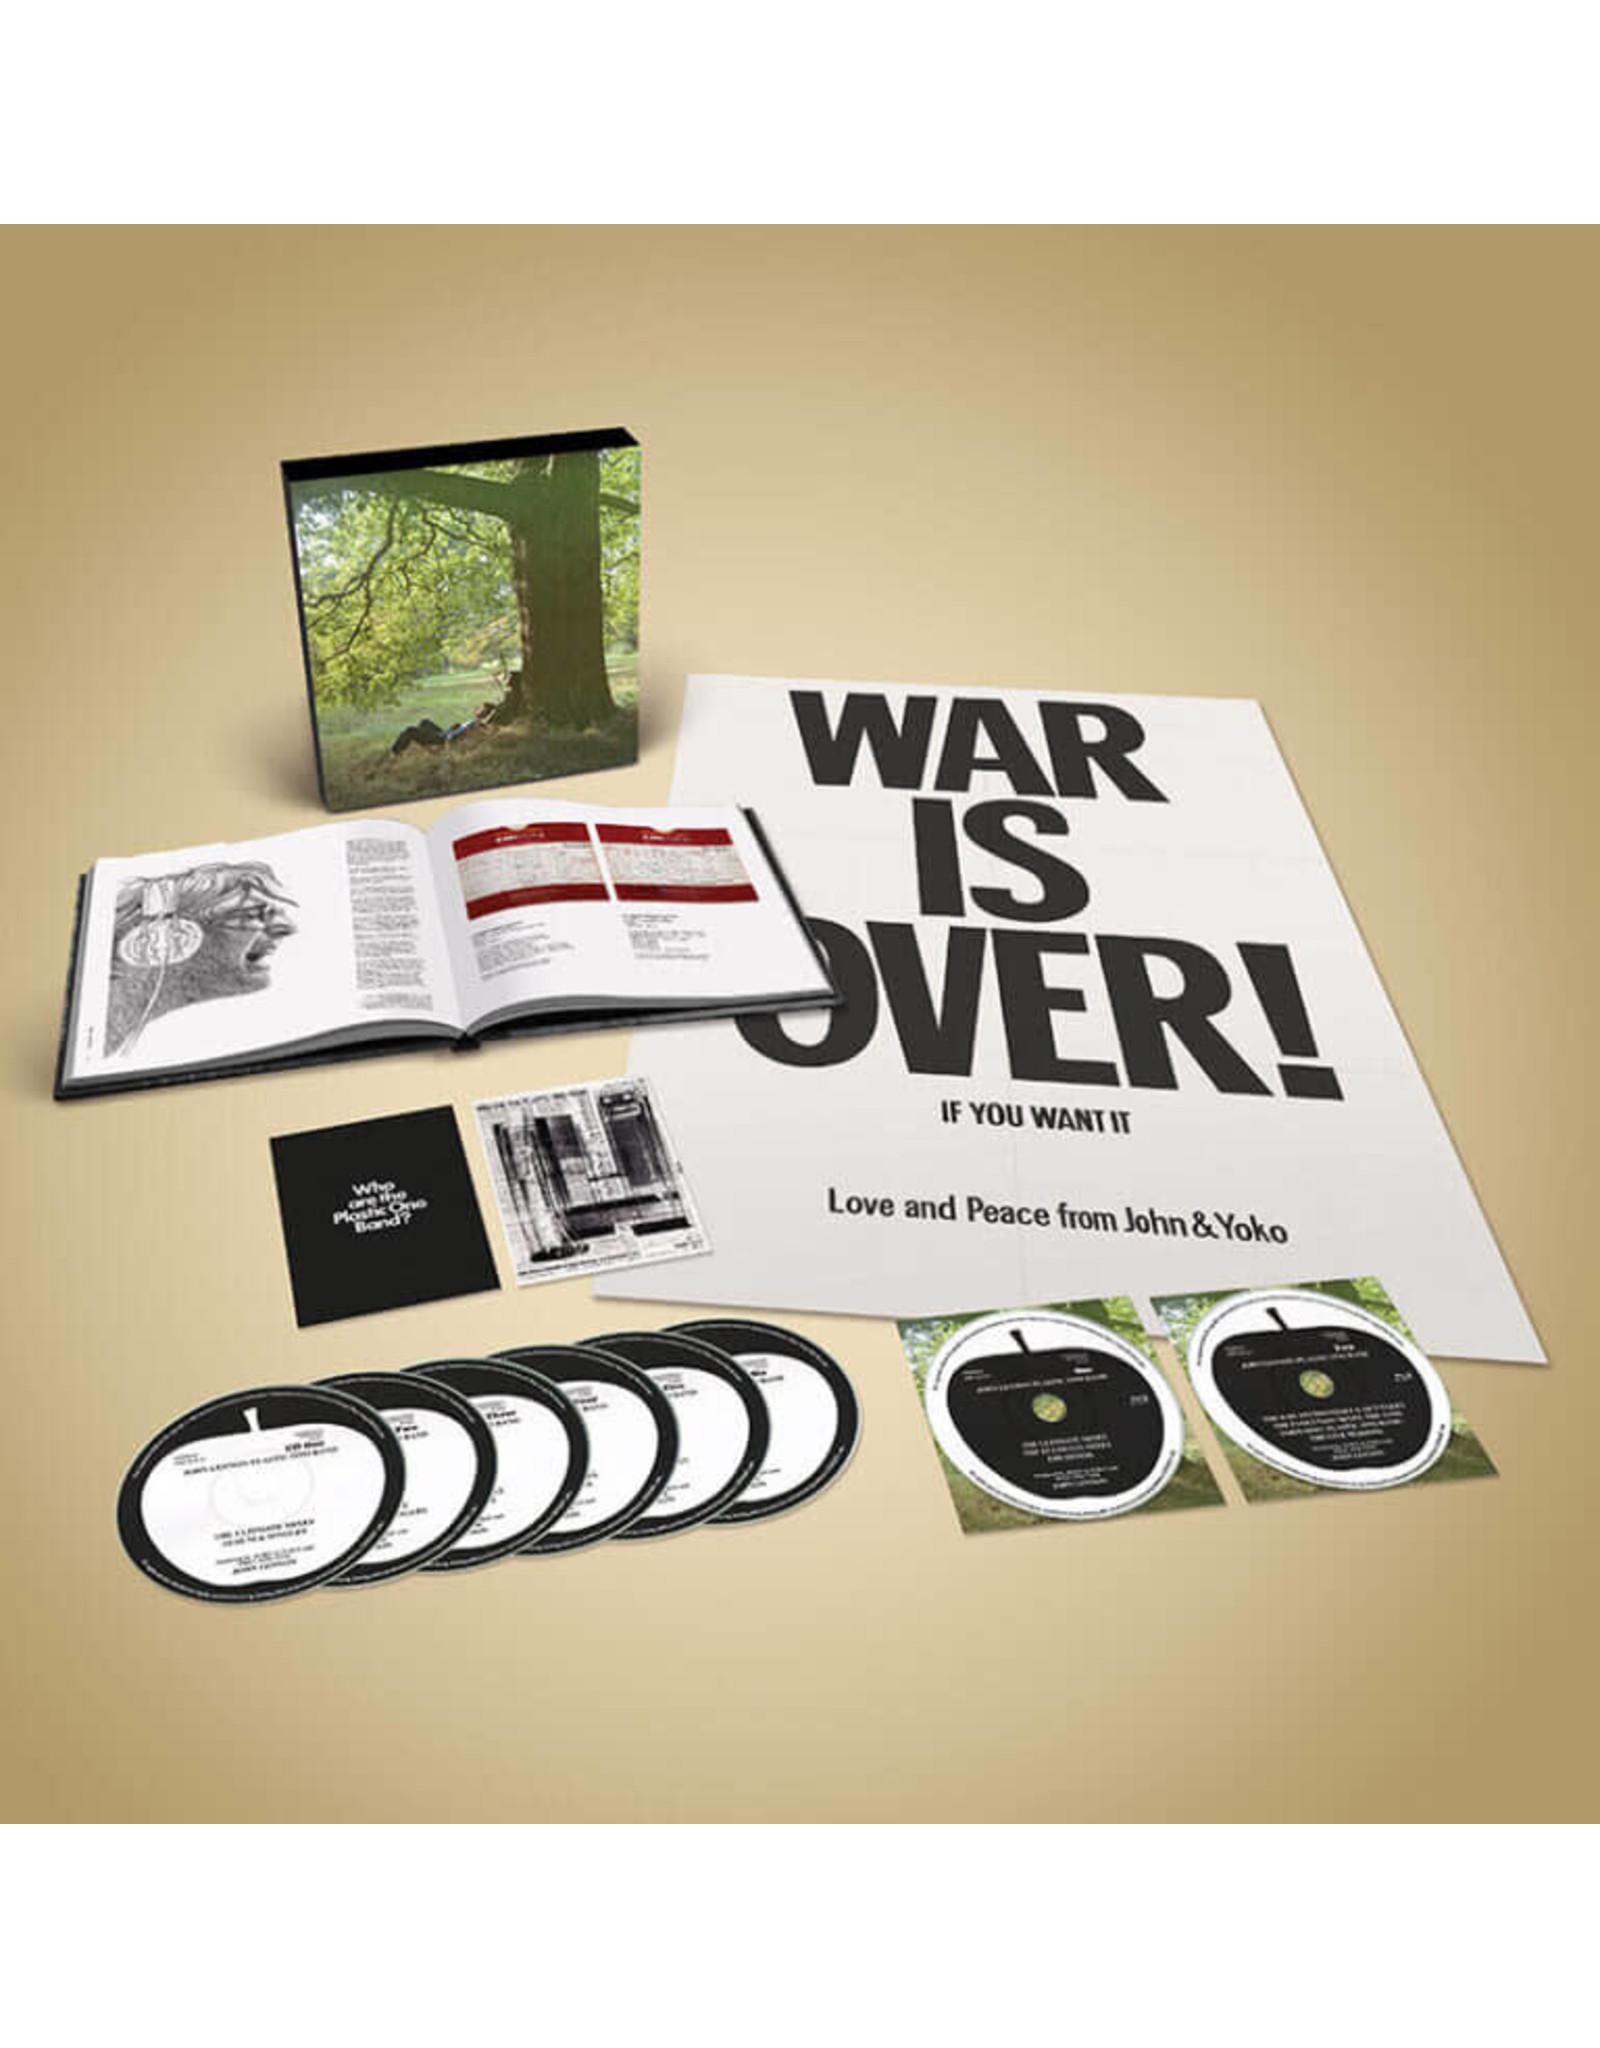 Lennon, John Plastic Ono Band - The Ultimate Collection Box Set 6CD/2BD